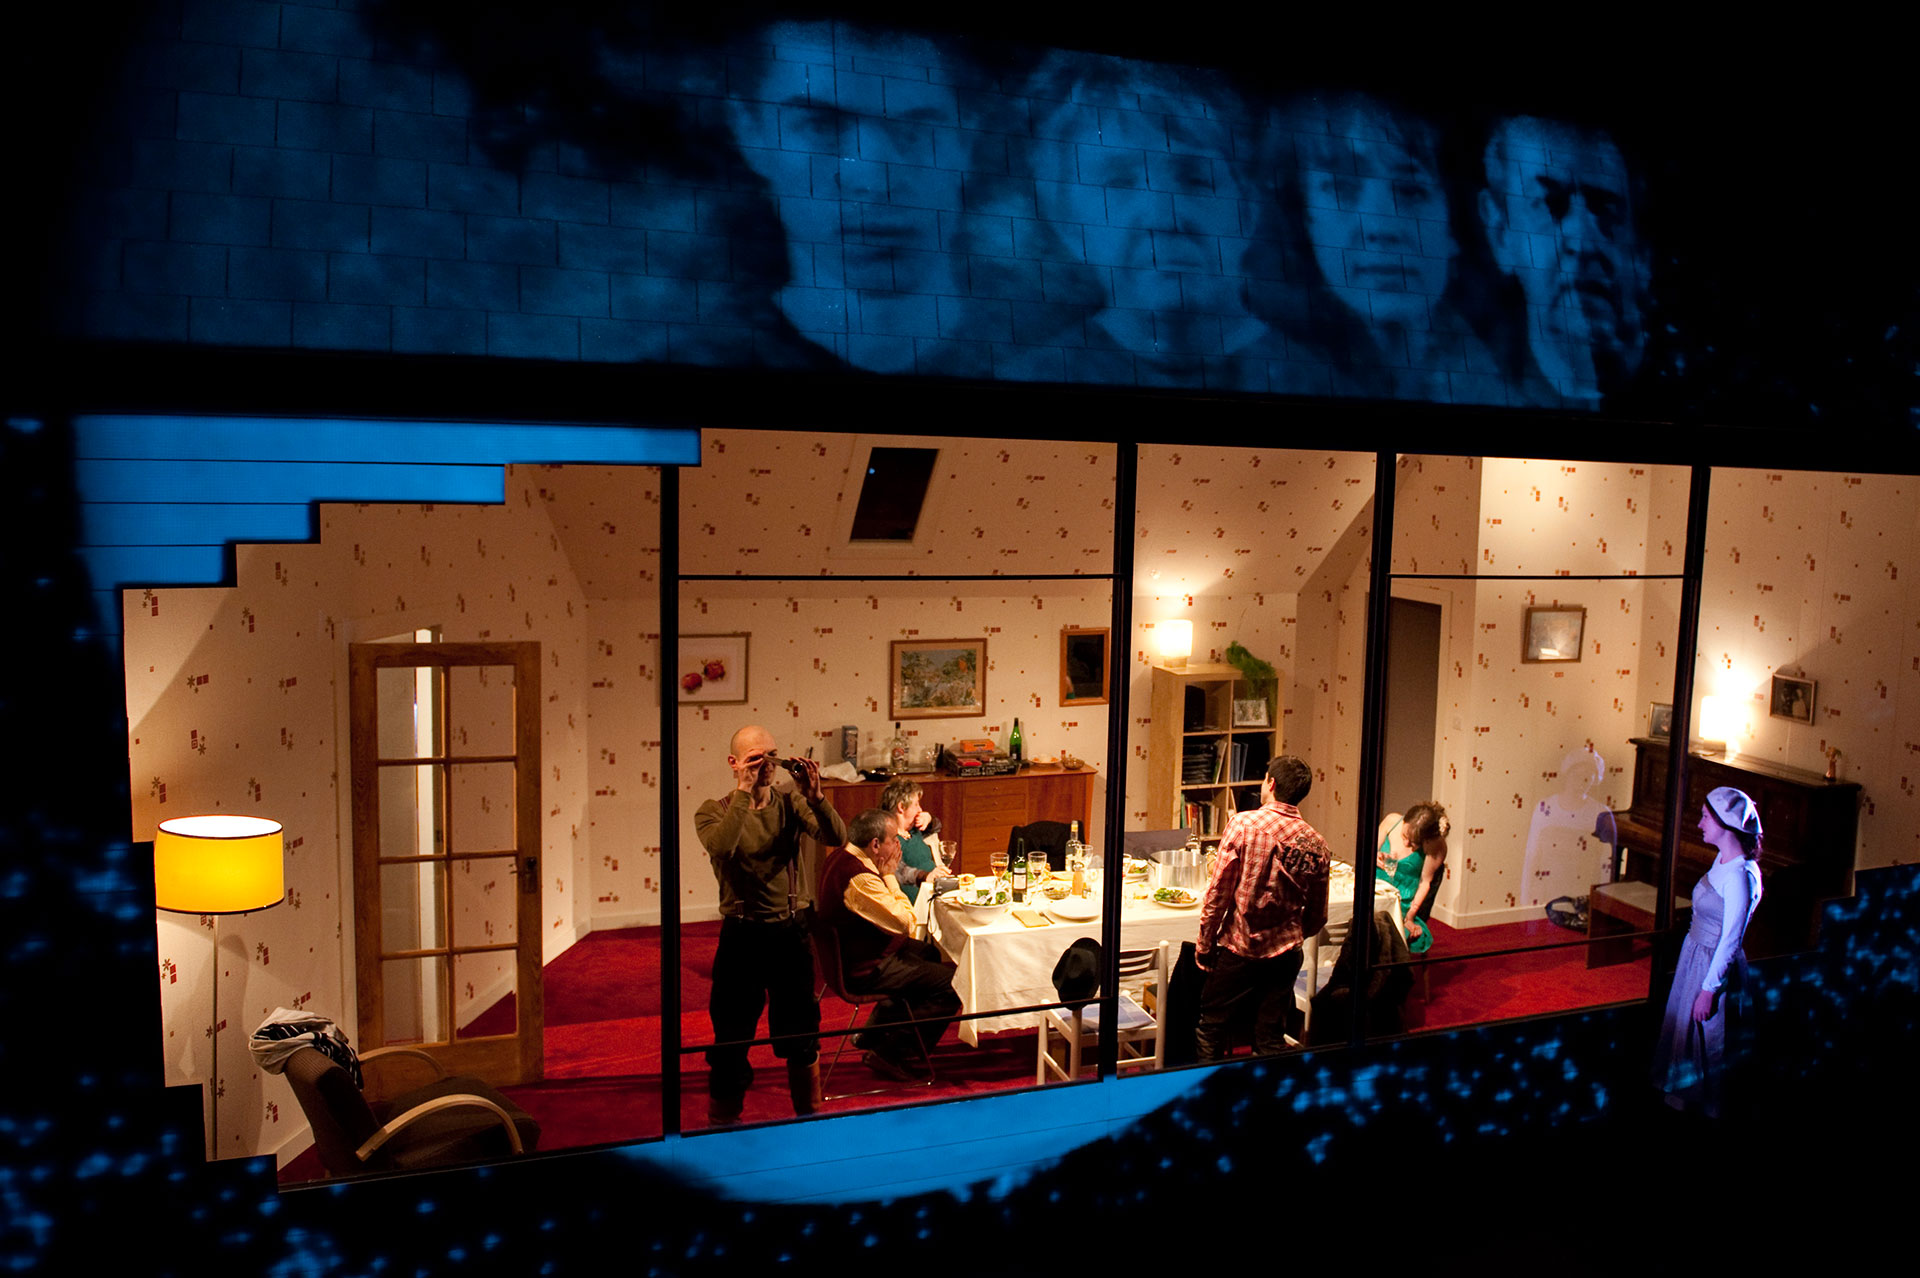 Interiors production shot